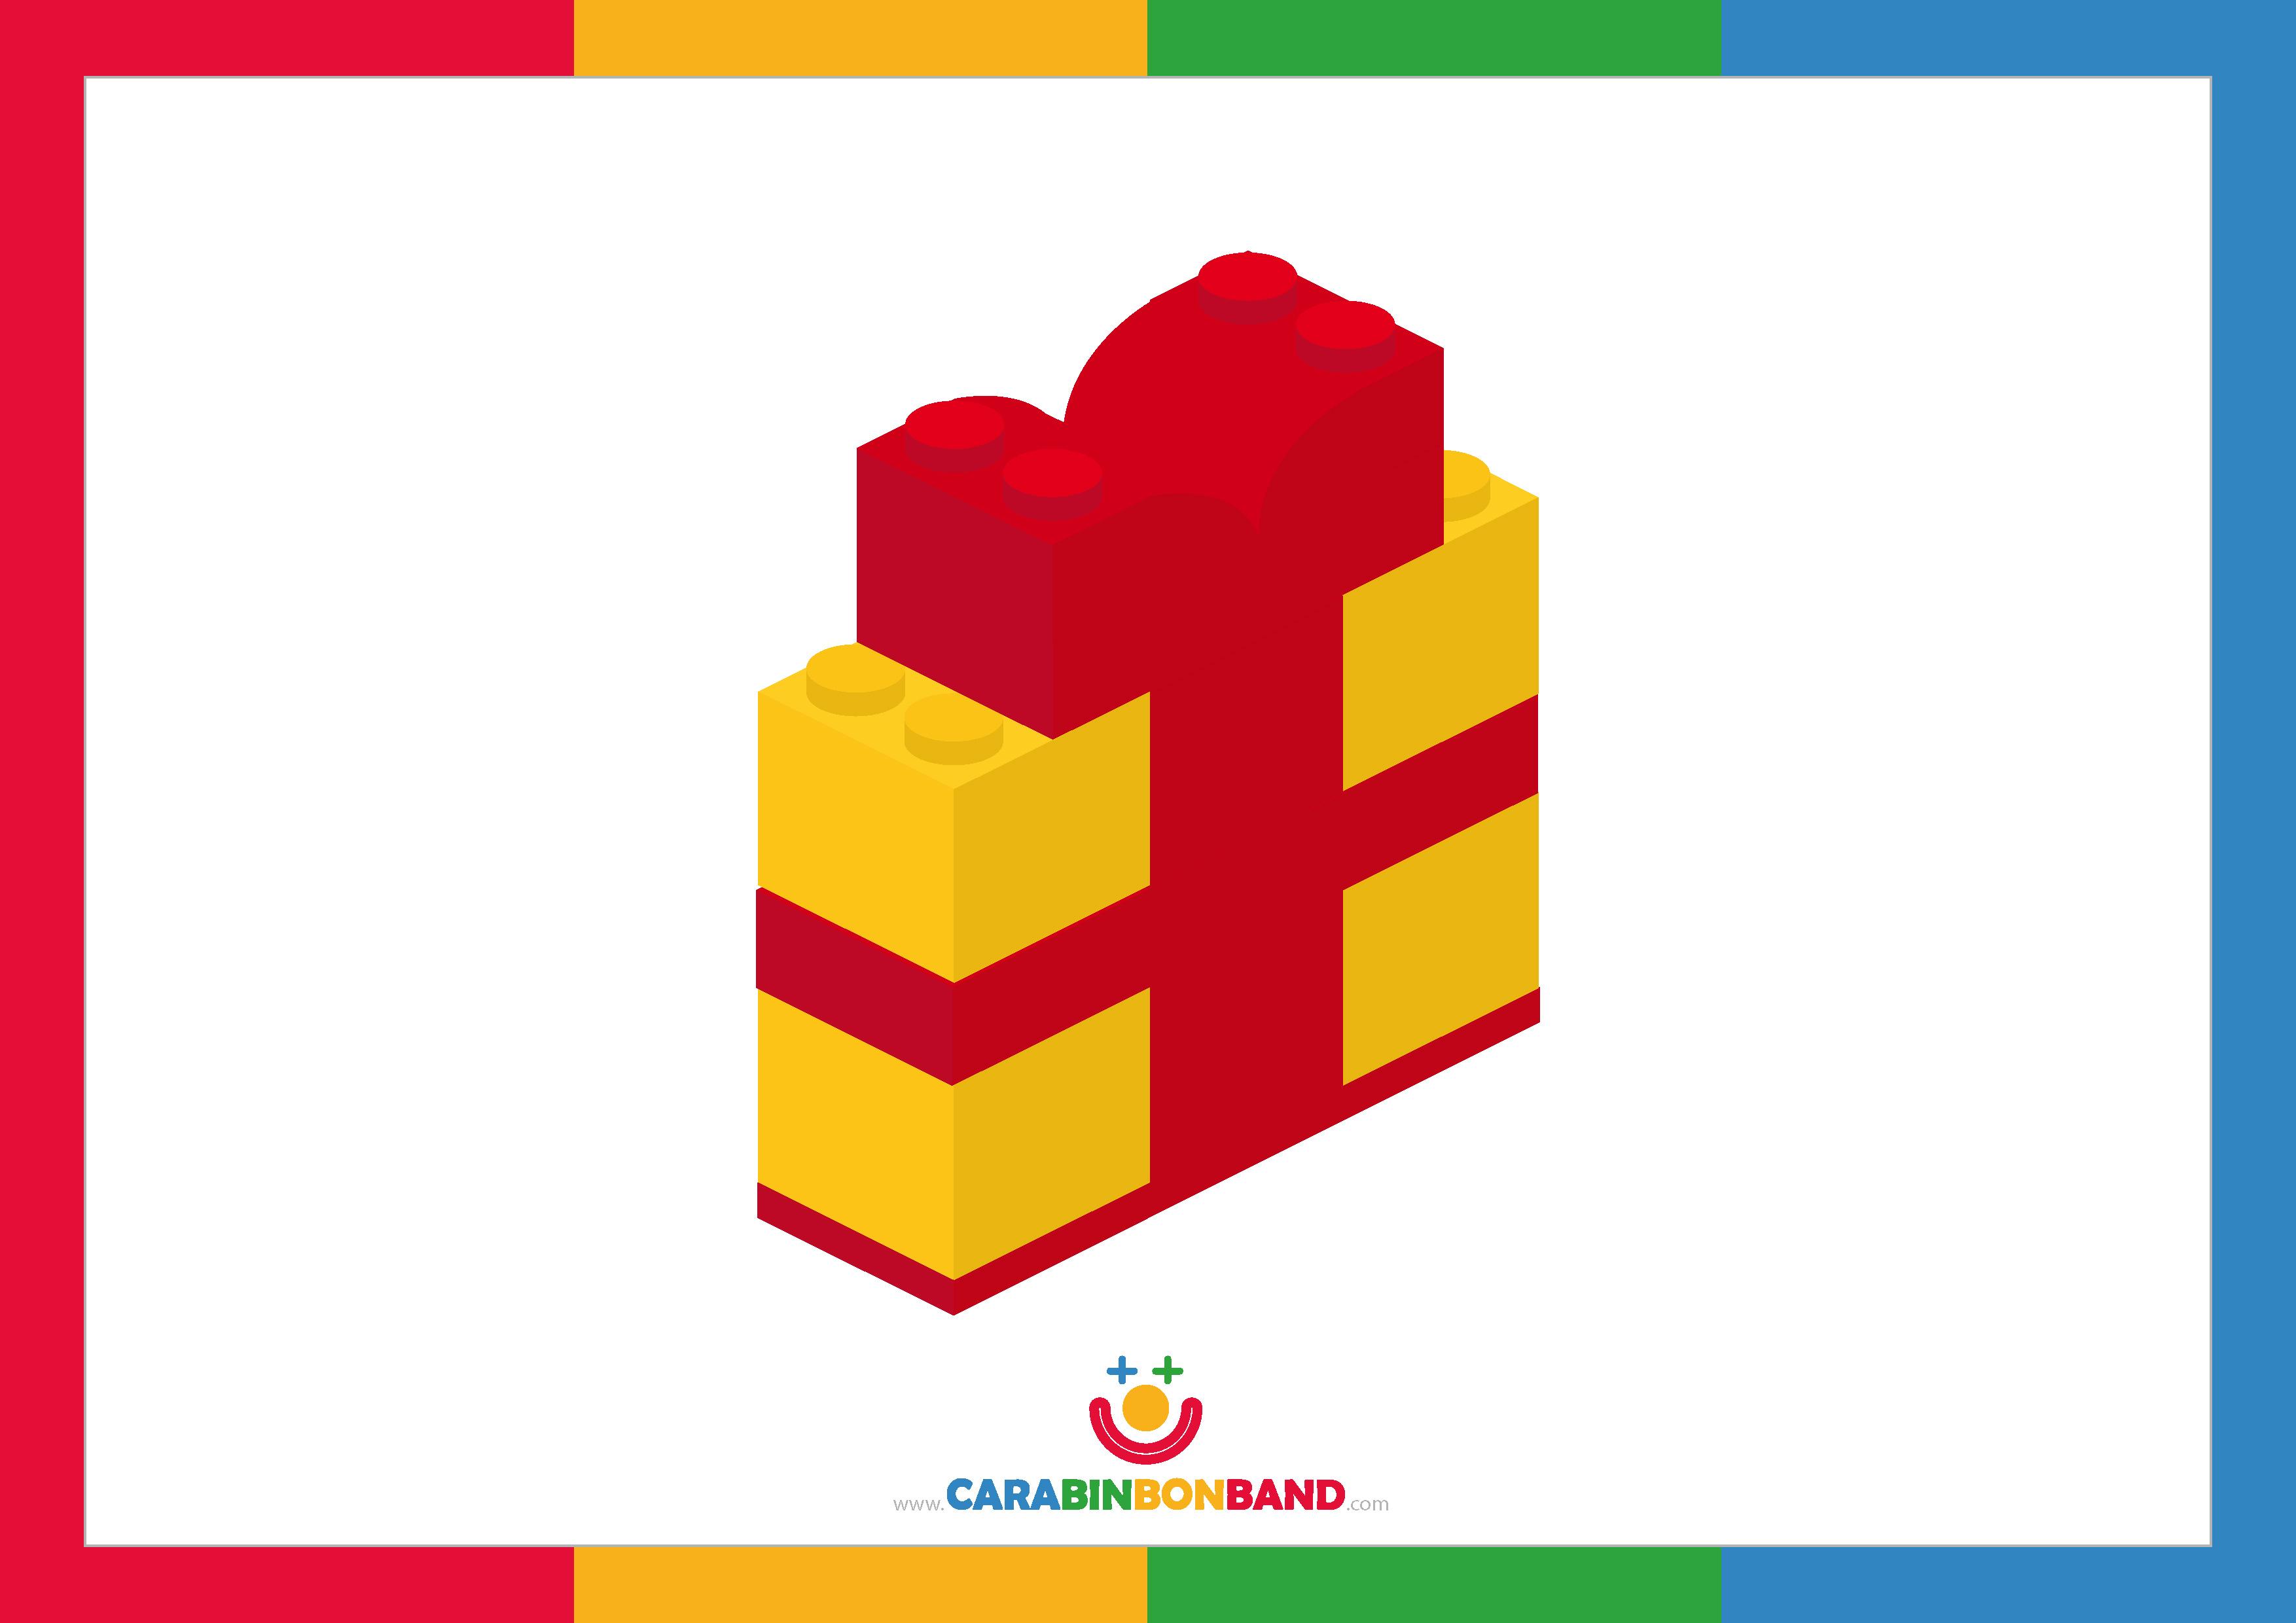 Láminas decorativas: paquete de regalo con bloques Lego